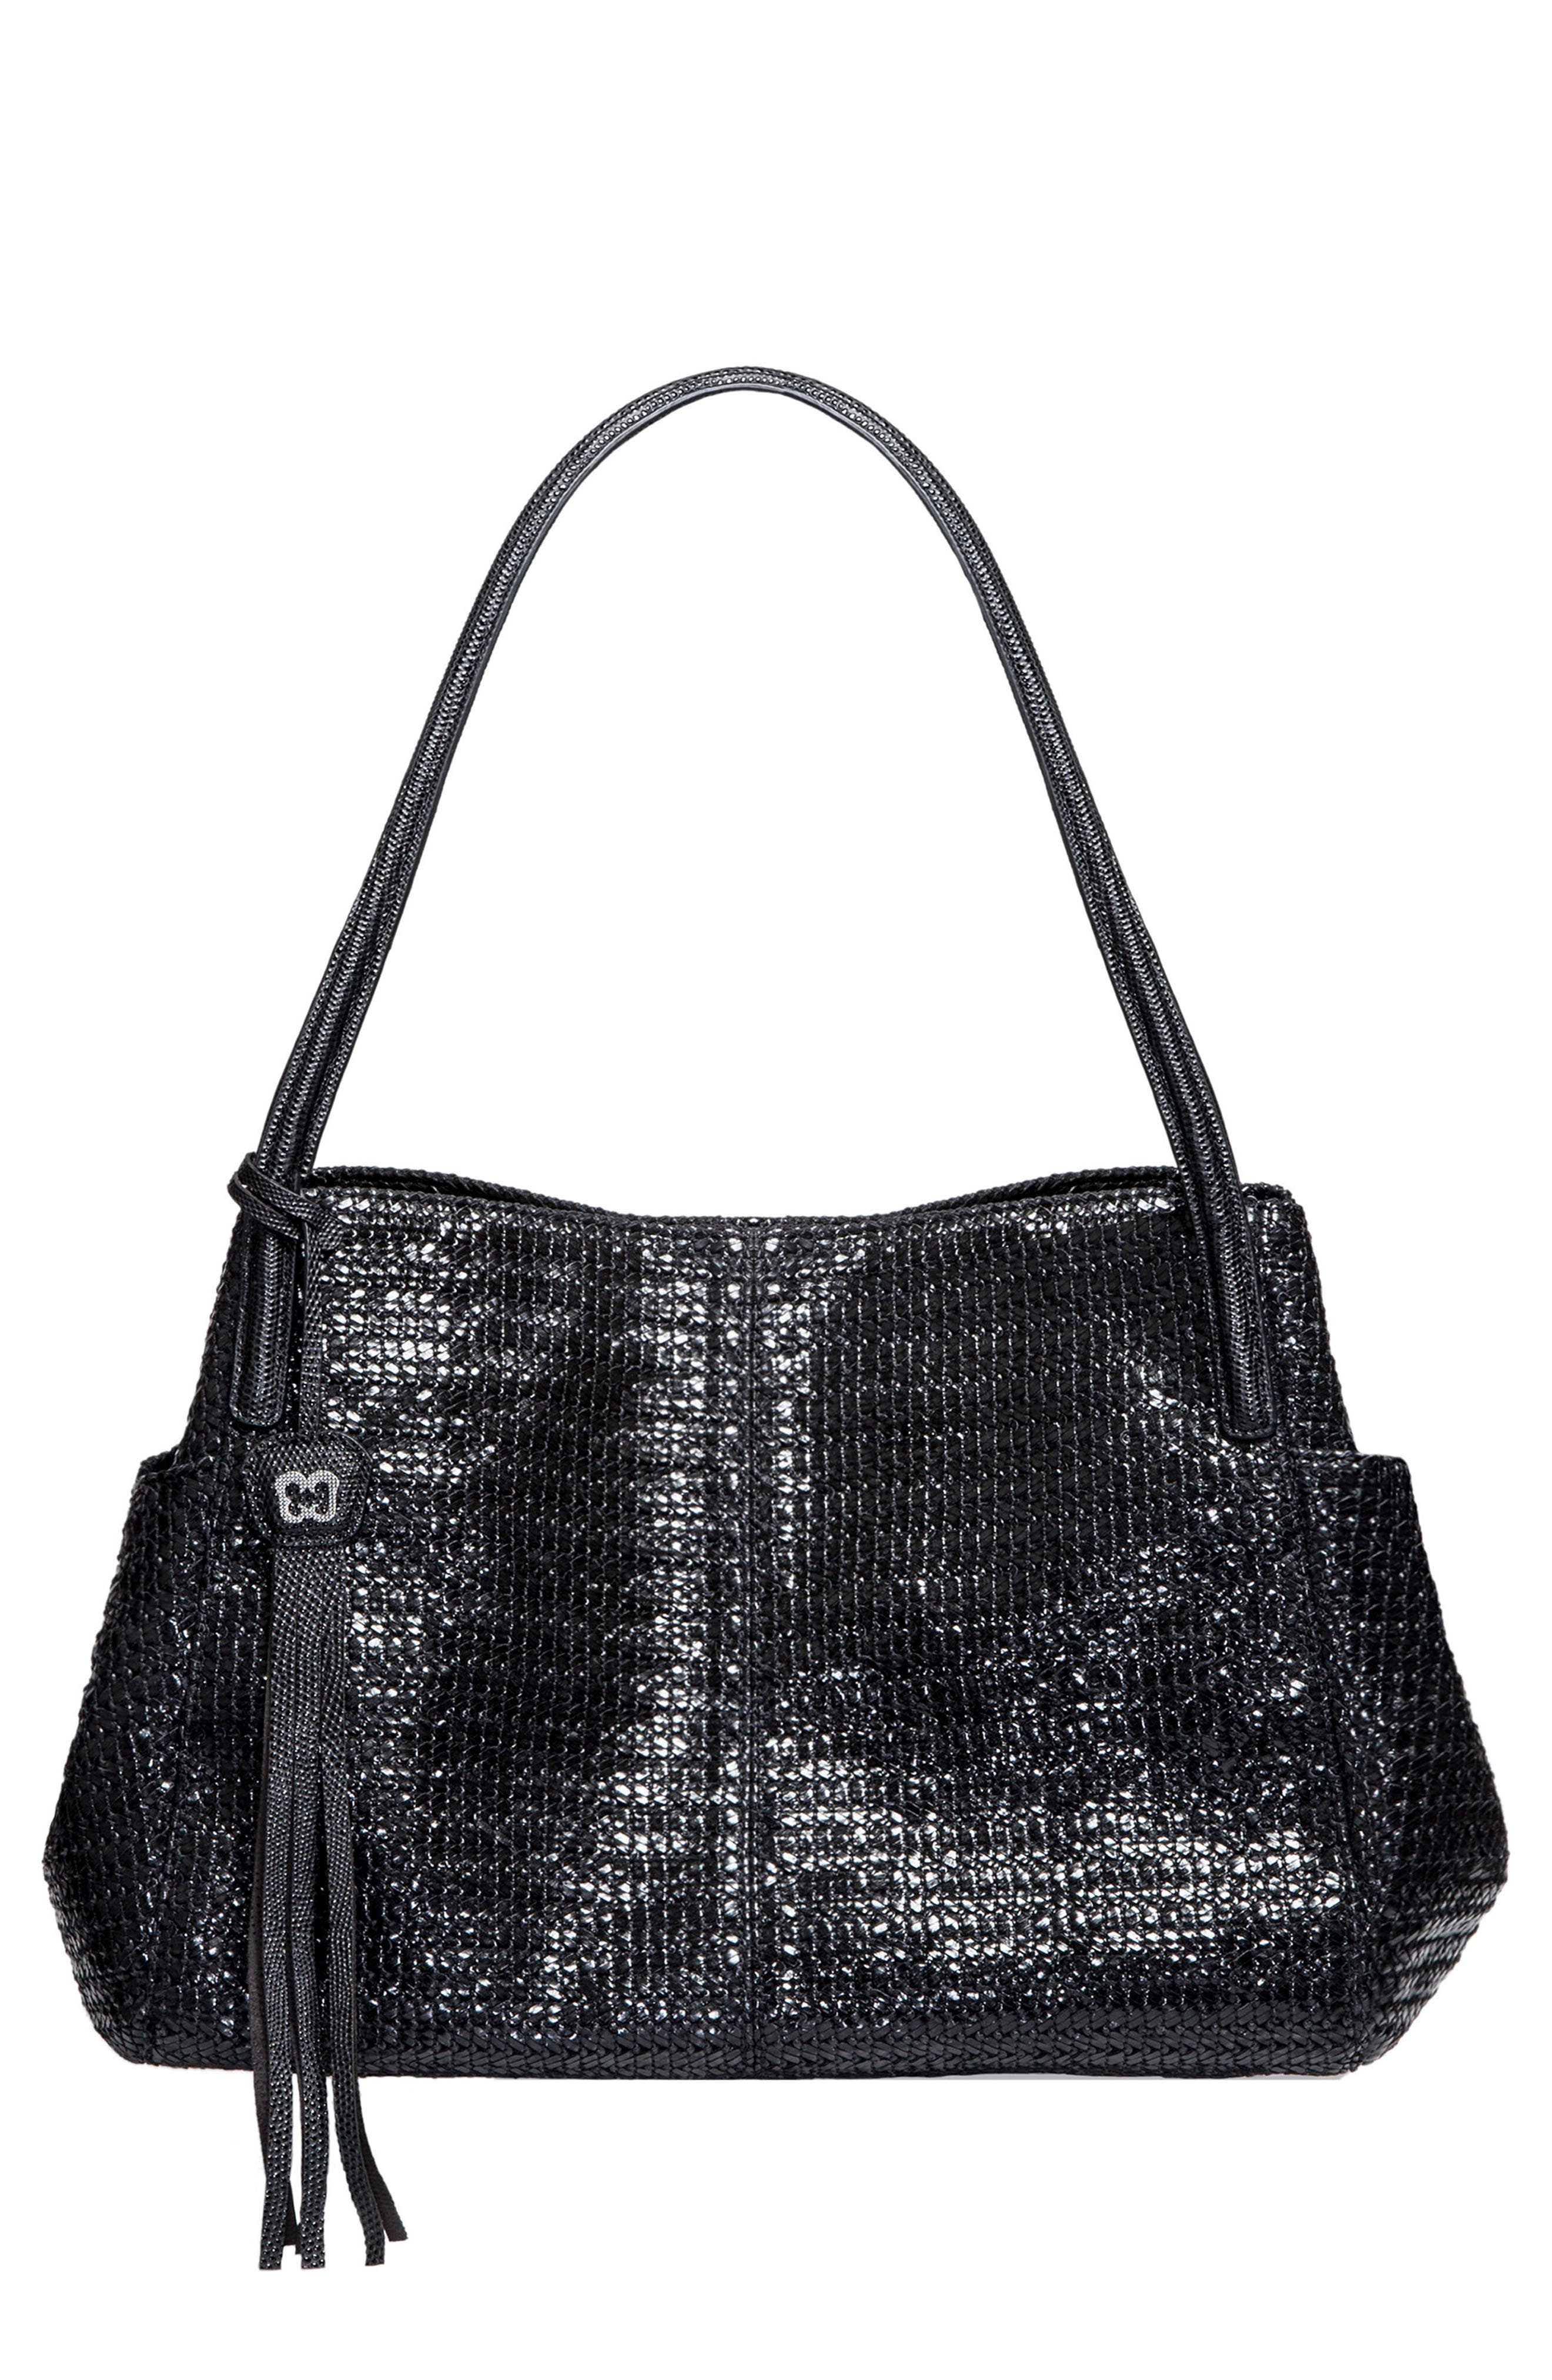 ERIC JAVITS 'Aura' Woven Shopper, Main, color, BLACK